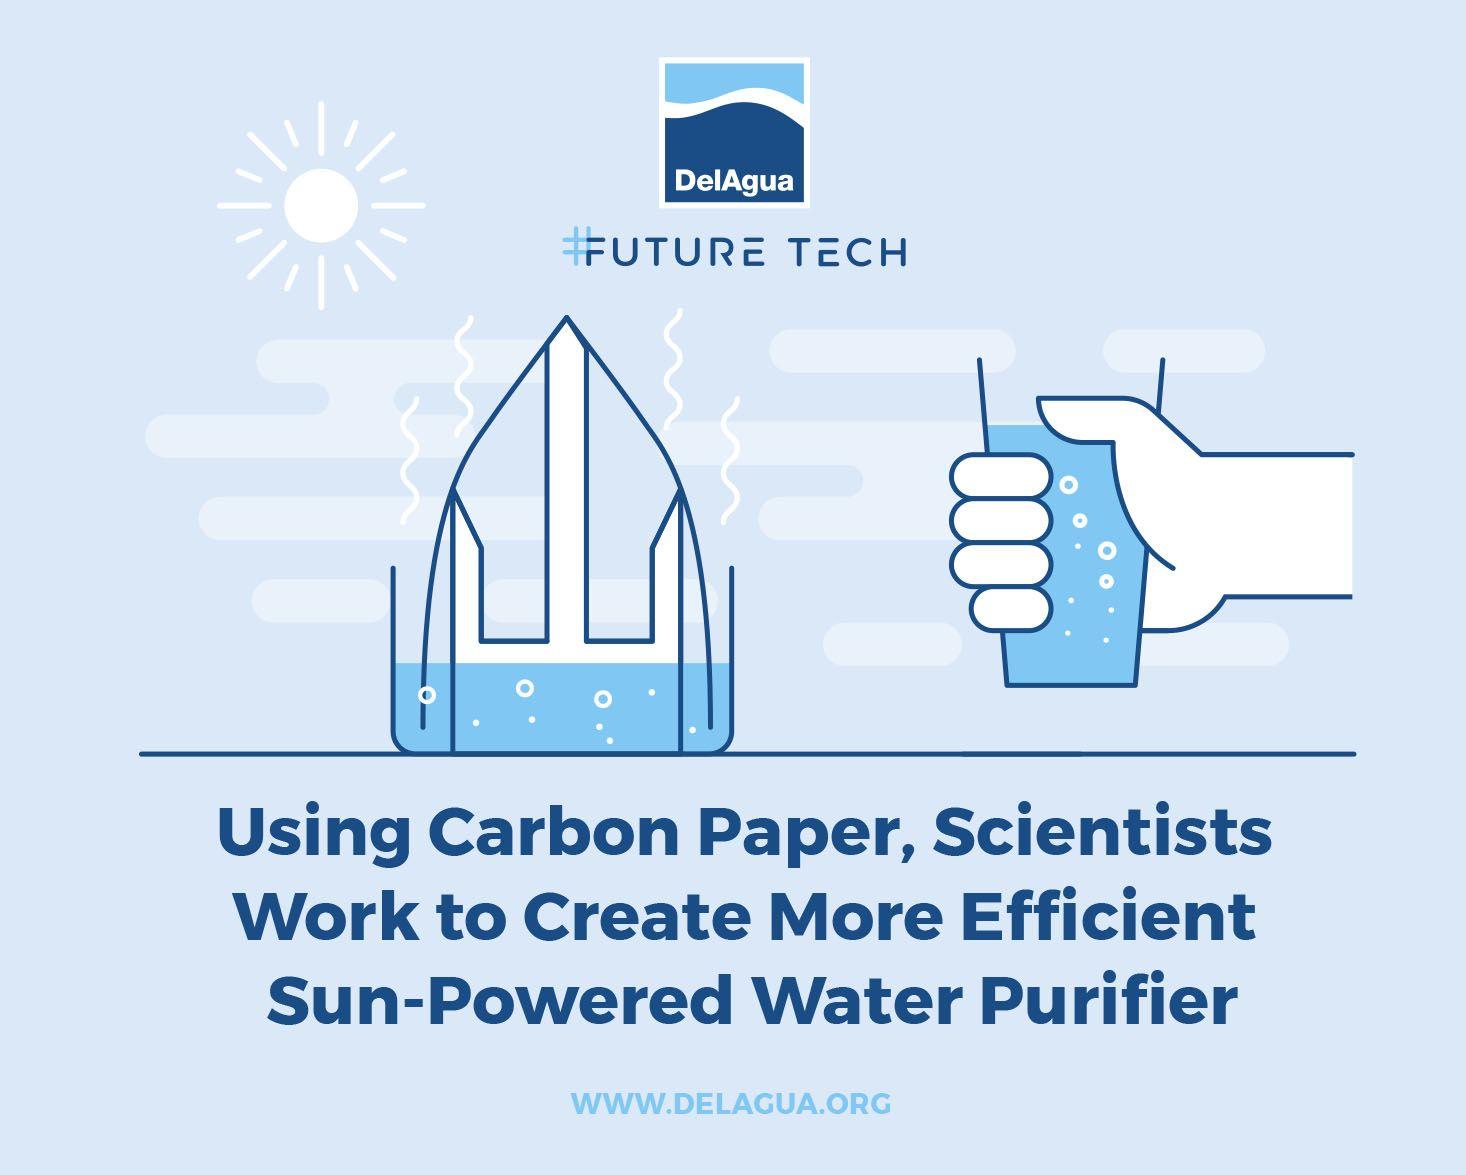 FutureTech - Scientists Work to Create More Efficient Sun